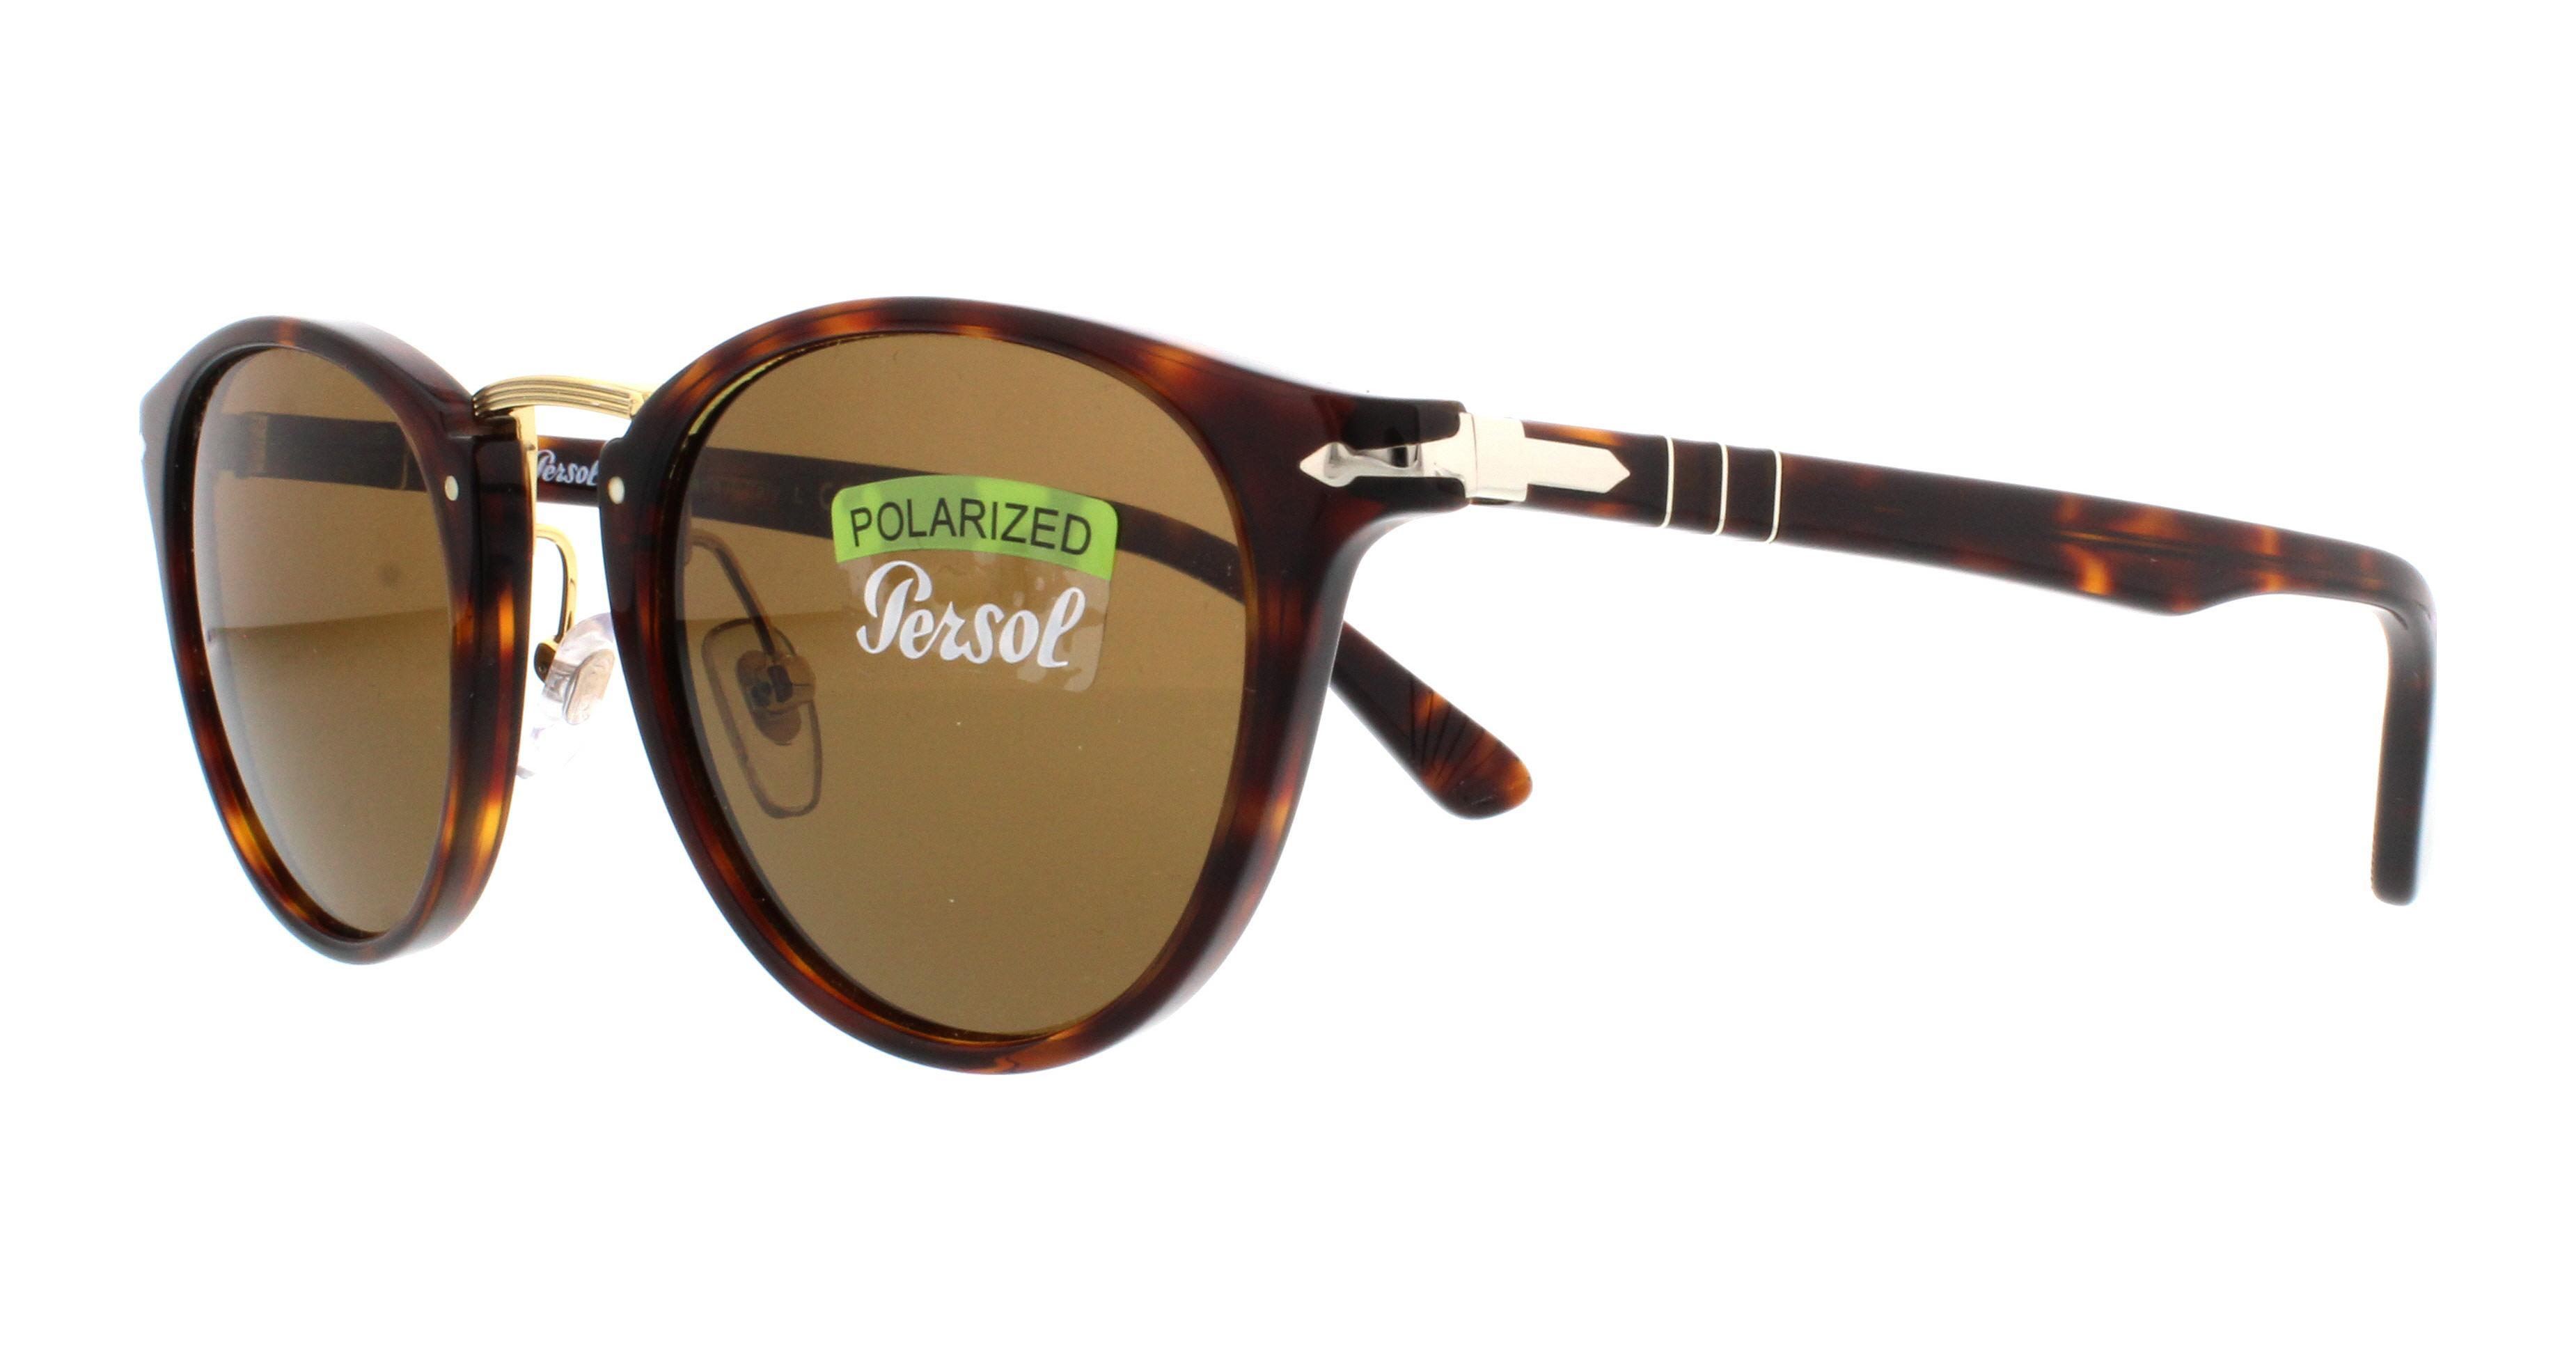 5d7a1745f1 sale. 95 31 Black. sale. 960 S3 Striped Brown